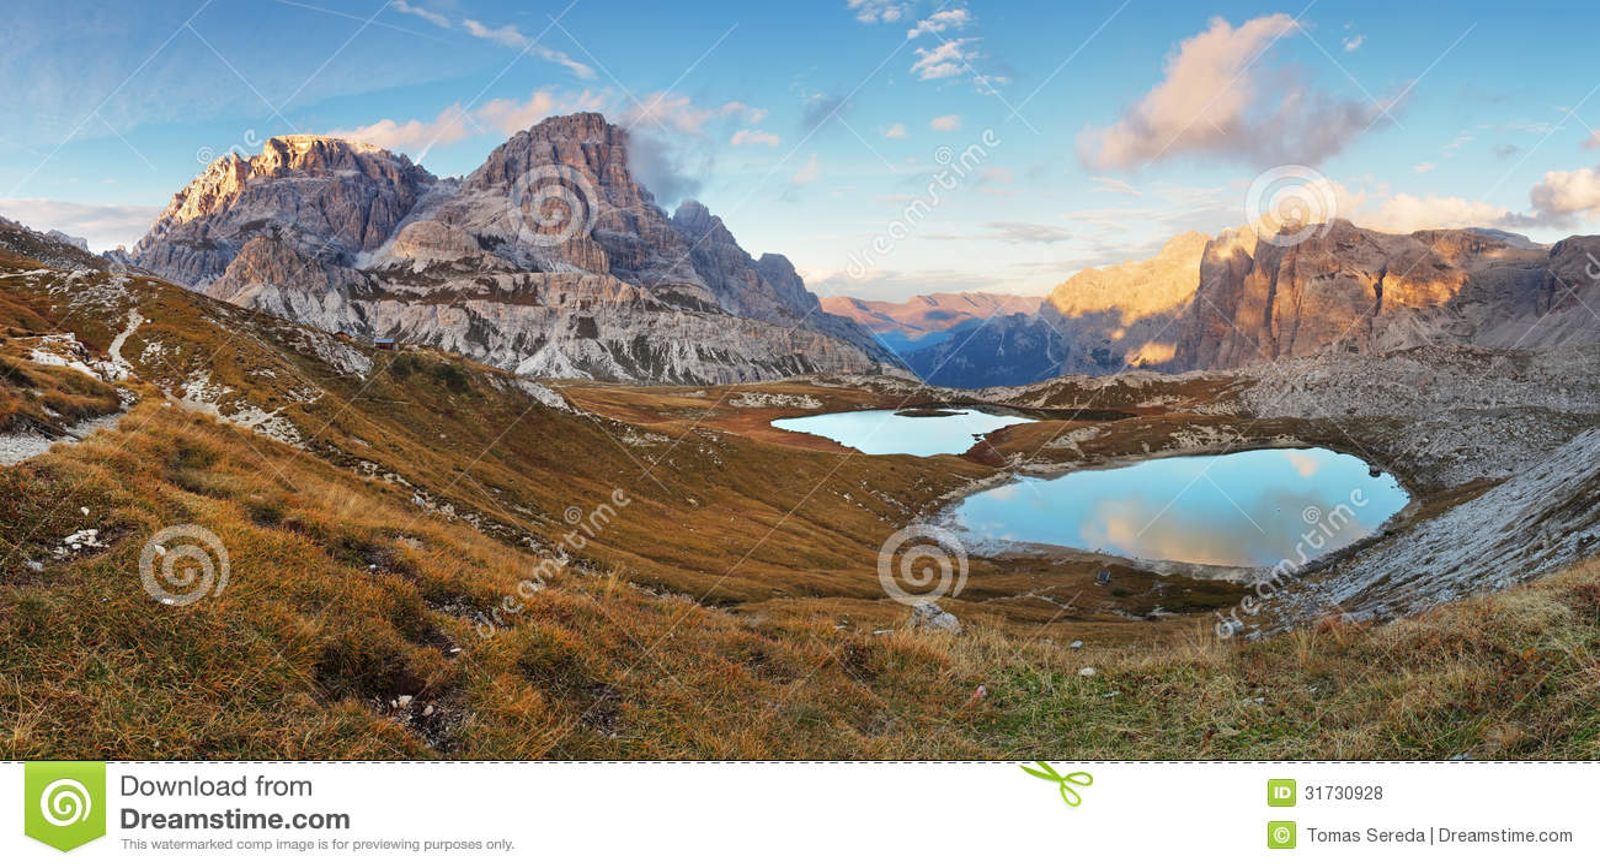 netter berg mit see italien alpen dolomit tre cime lago stockfoto bild von italien. Black Bedroom Furniture Sets. Home Design Ideas